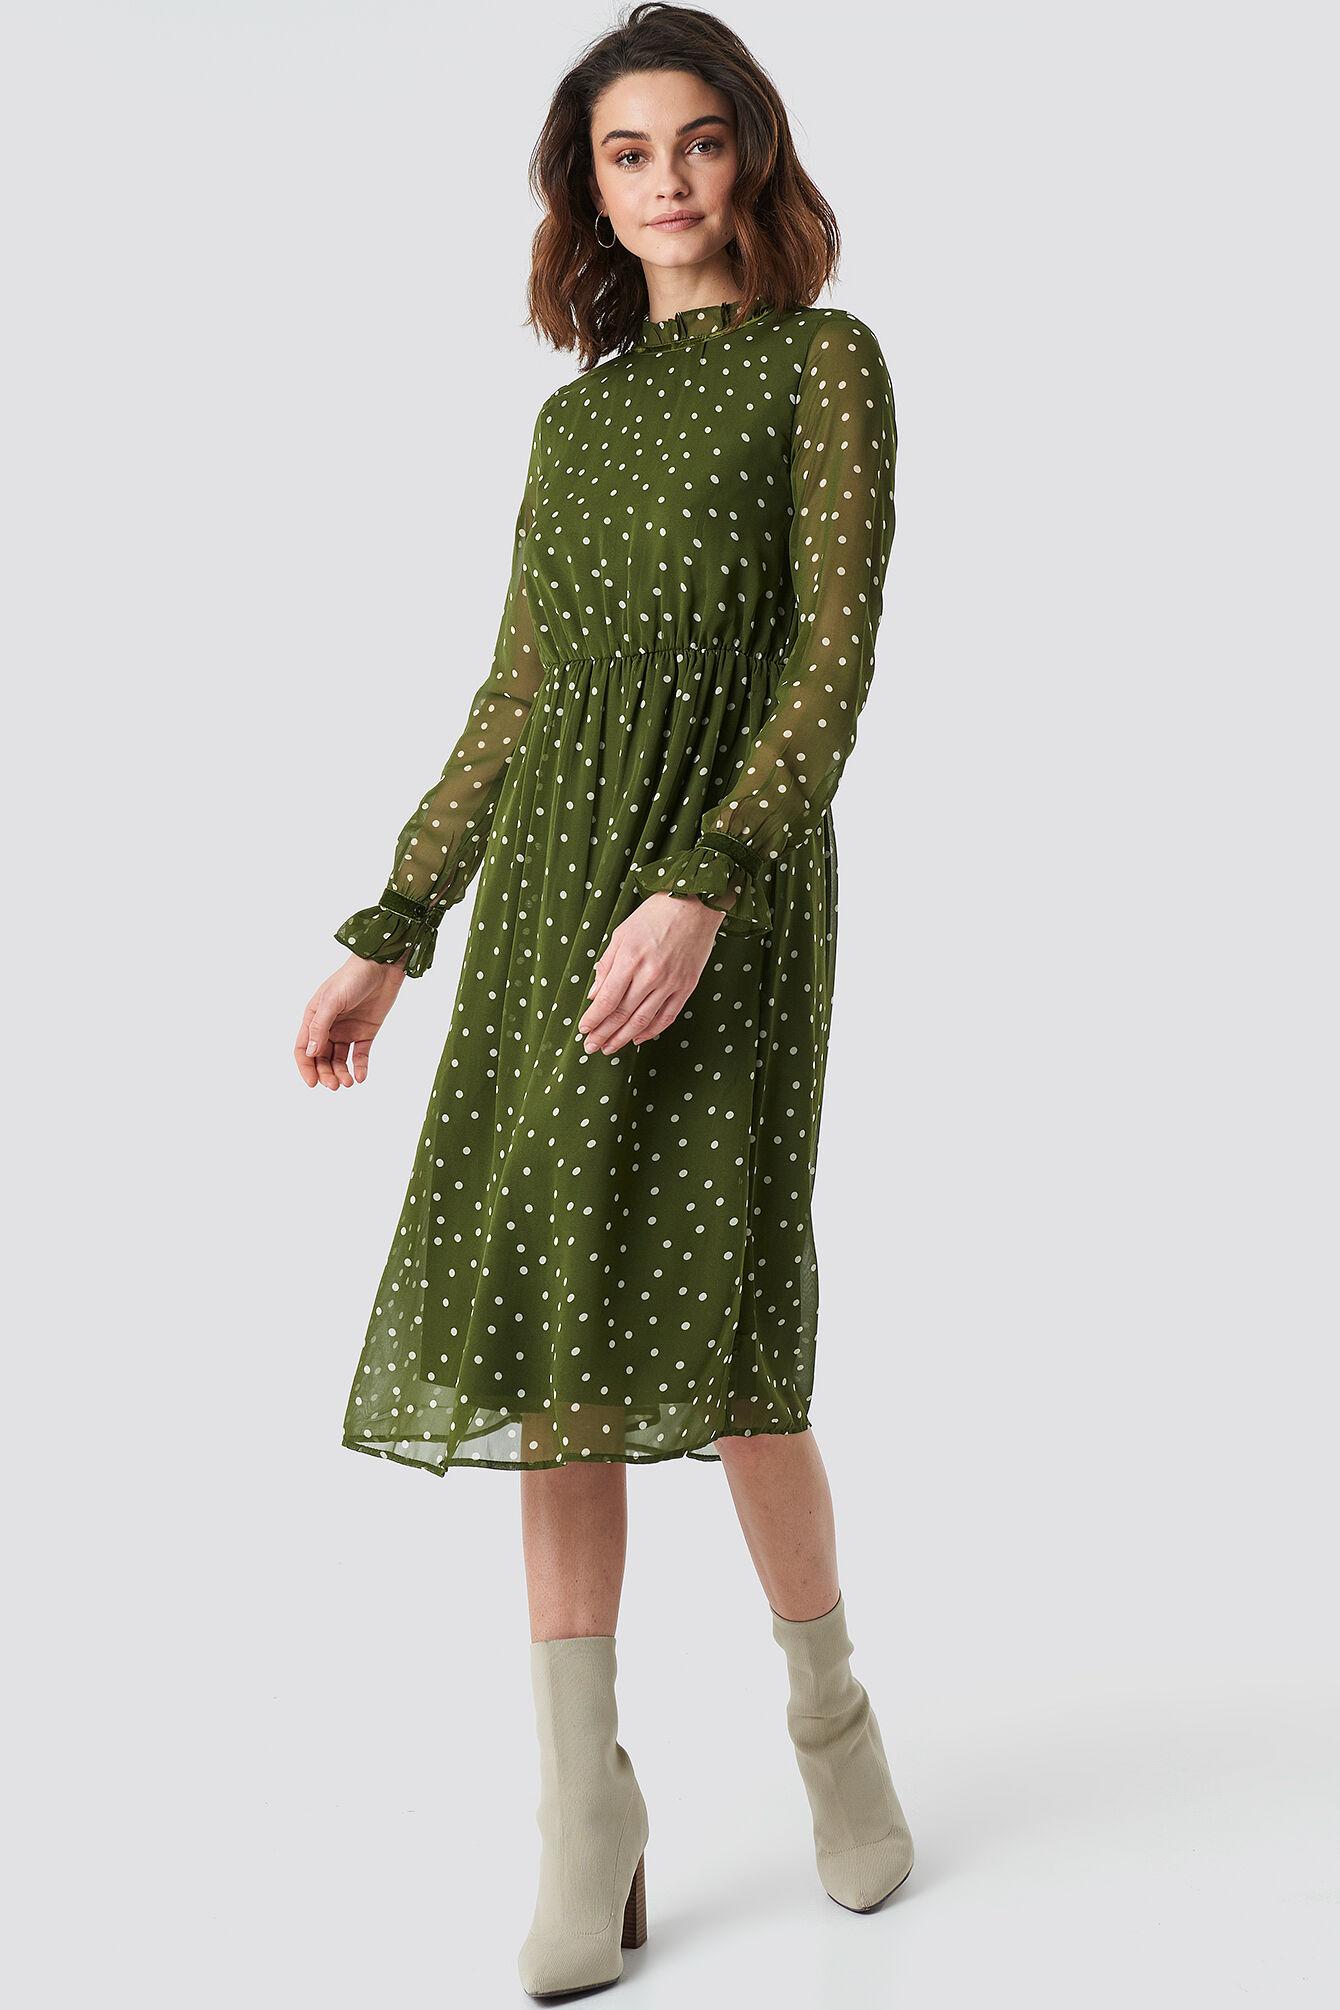 Image of NA-KD Boho Frill Detail High Neck Chiffon Dress - Green